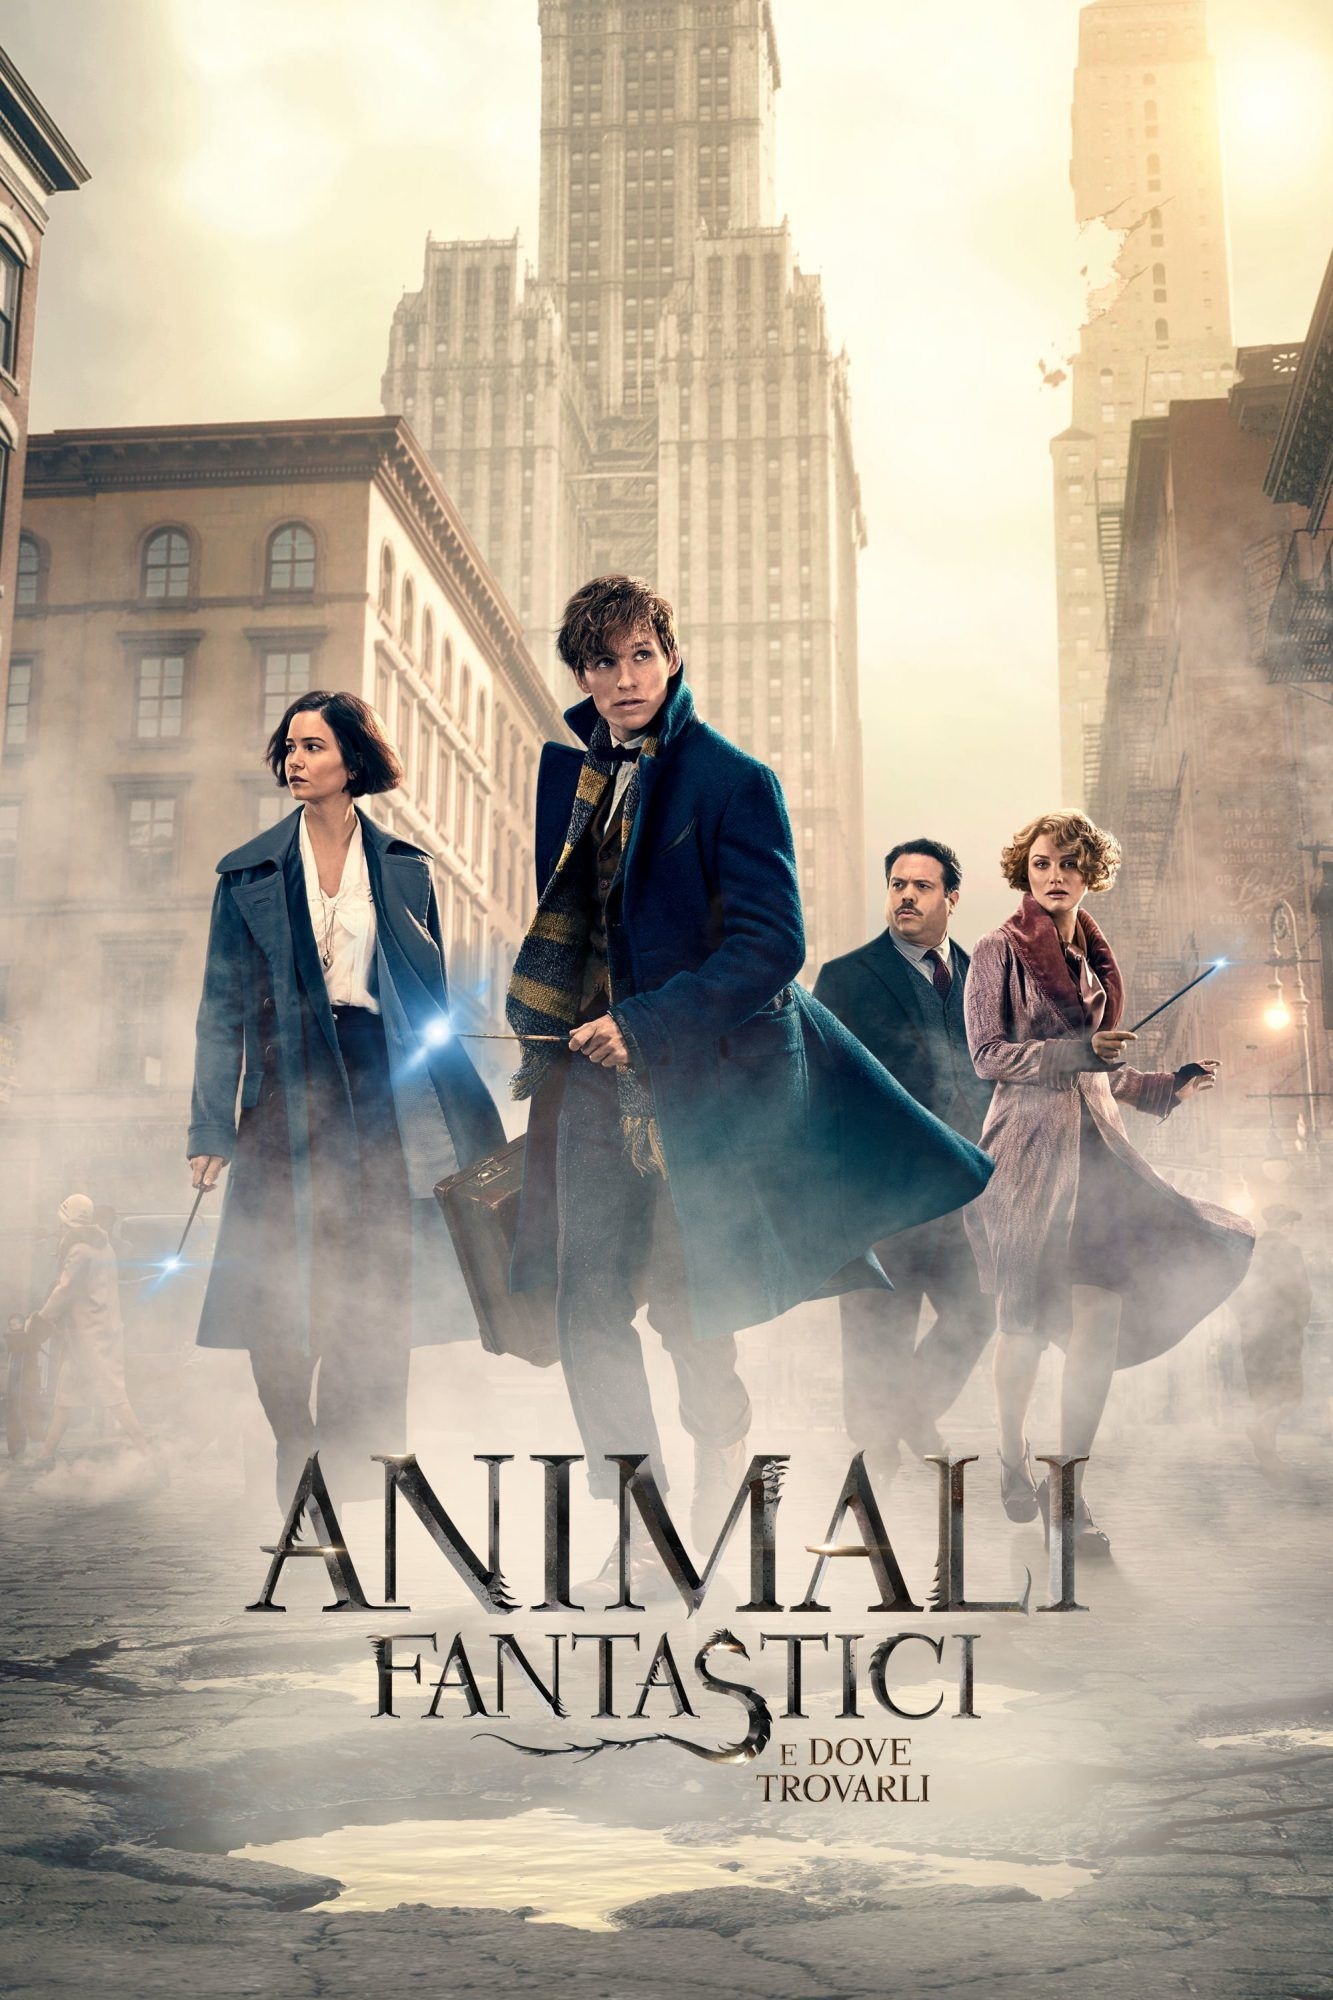 Animali Fantastici E Dove Trovarli Animali Fantastici Animali Film